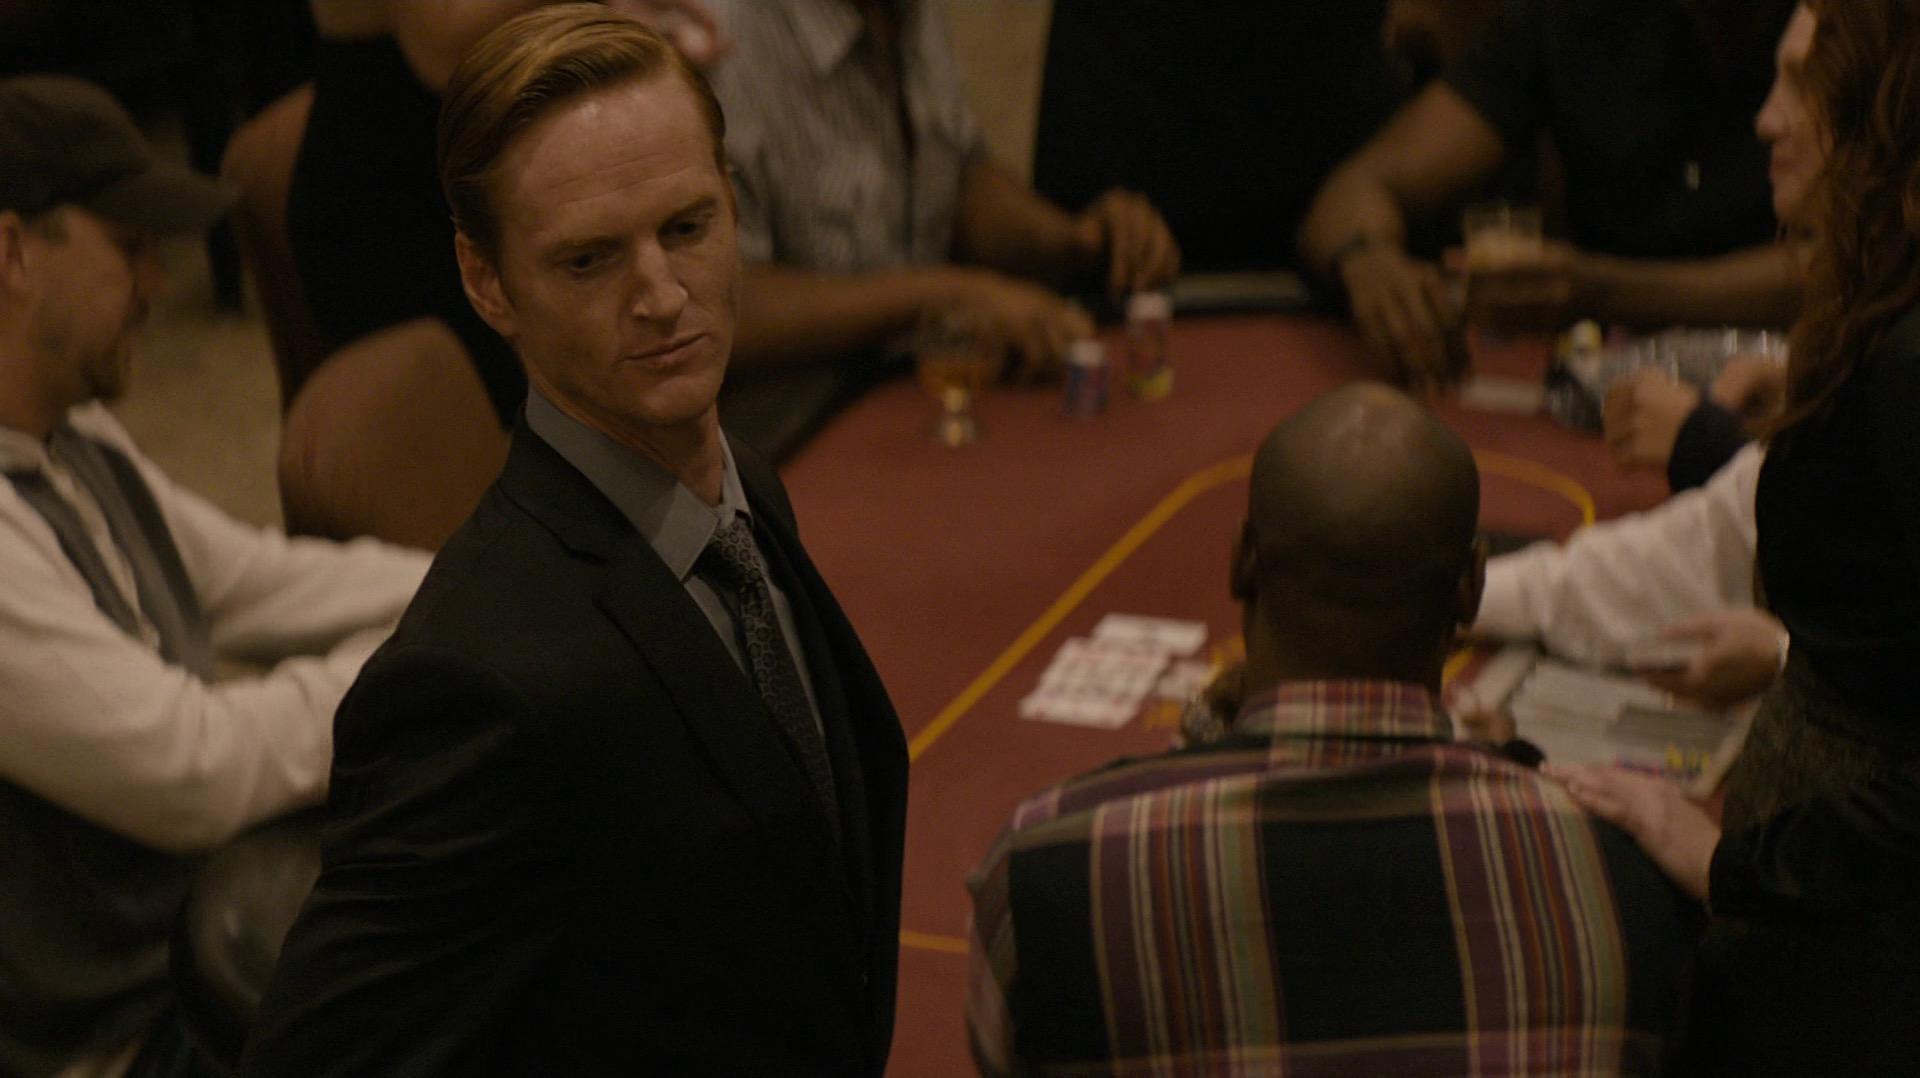 Blake in the casino